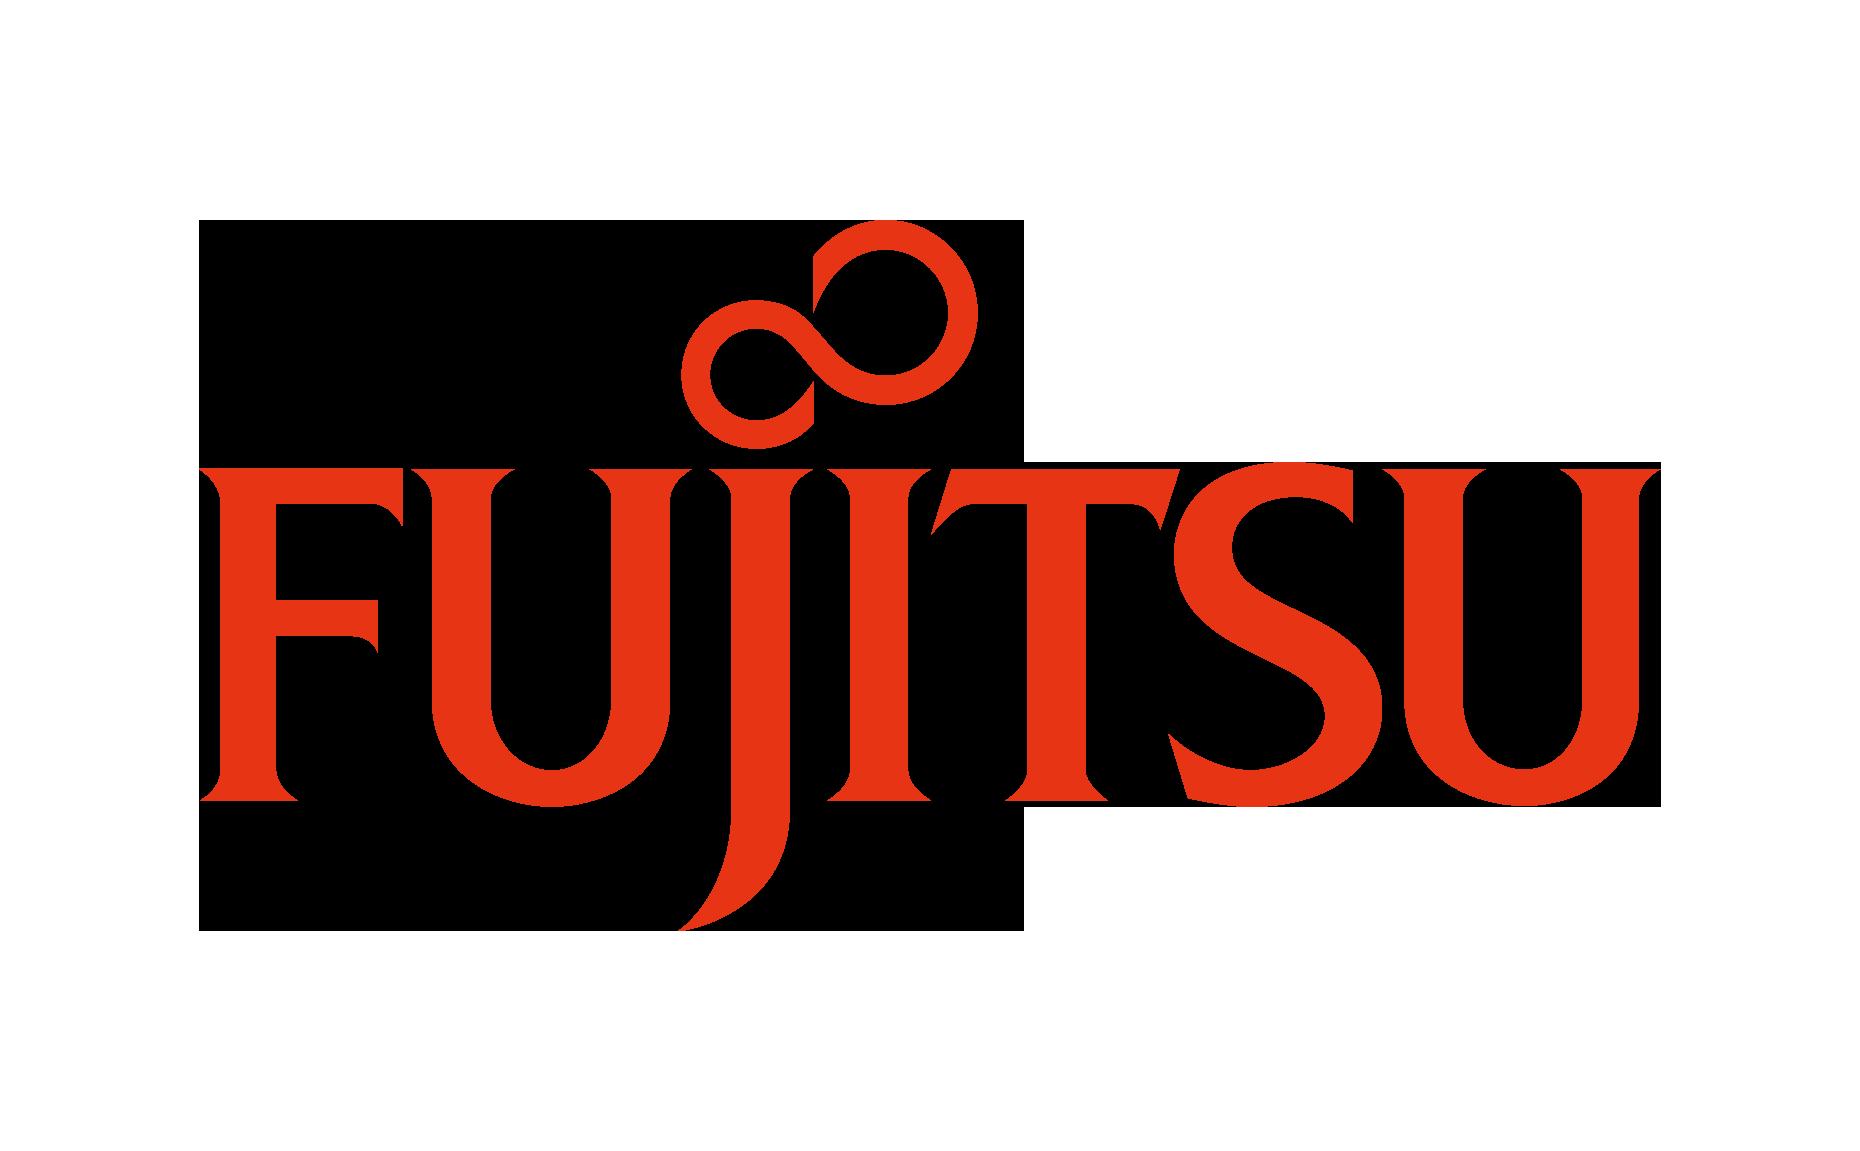 kisspng-logo-fujitsu-variable-refrigerant-flow-computer-so-firmenkontaktmesse-pyramid-aussteller-5bfa4170b2a377.8875222615431274087317